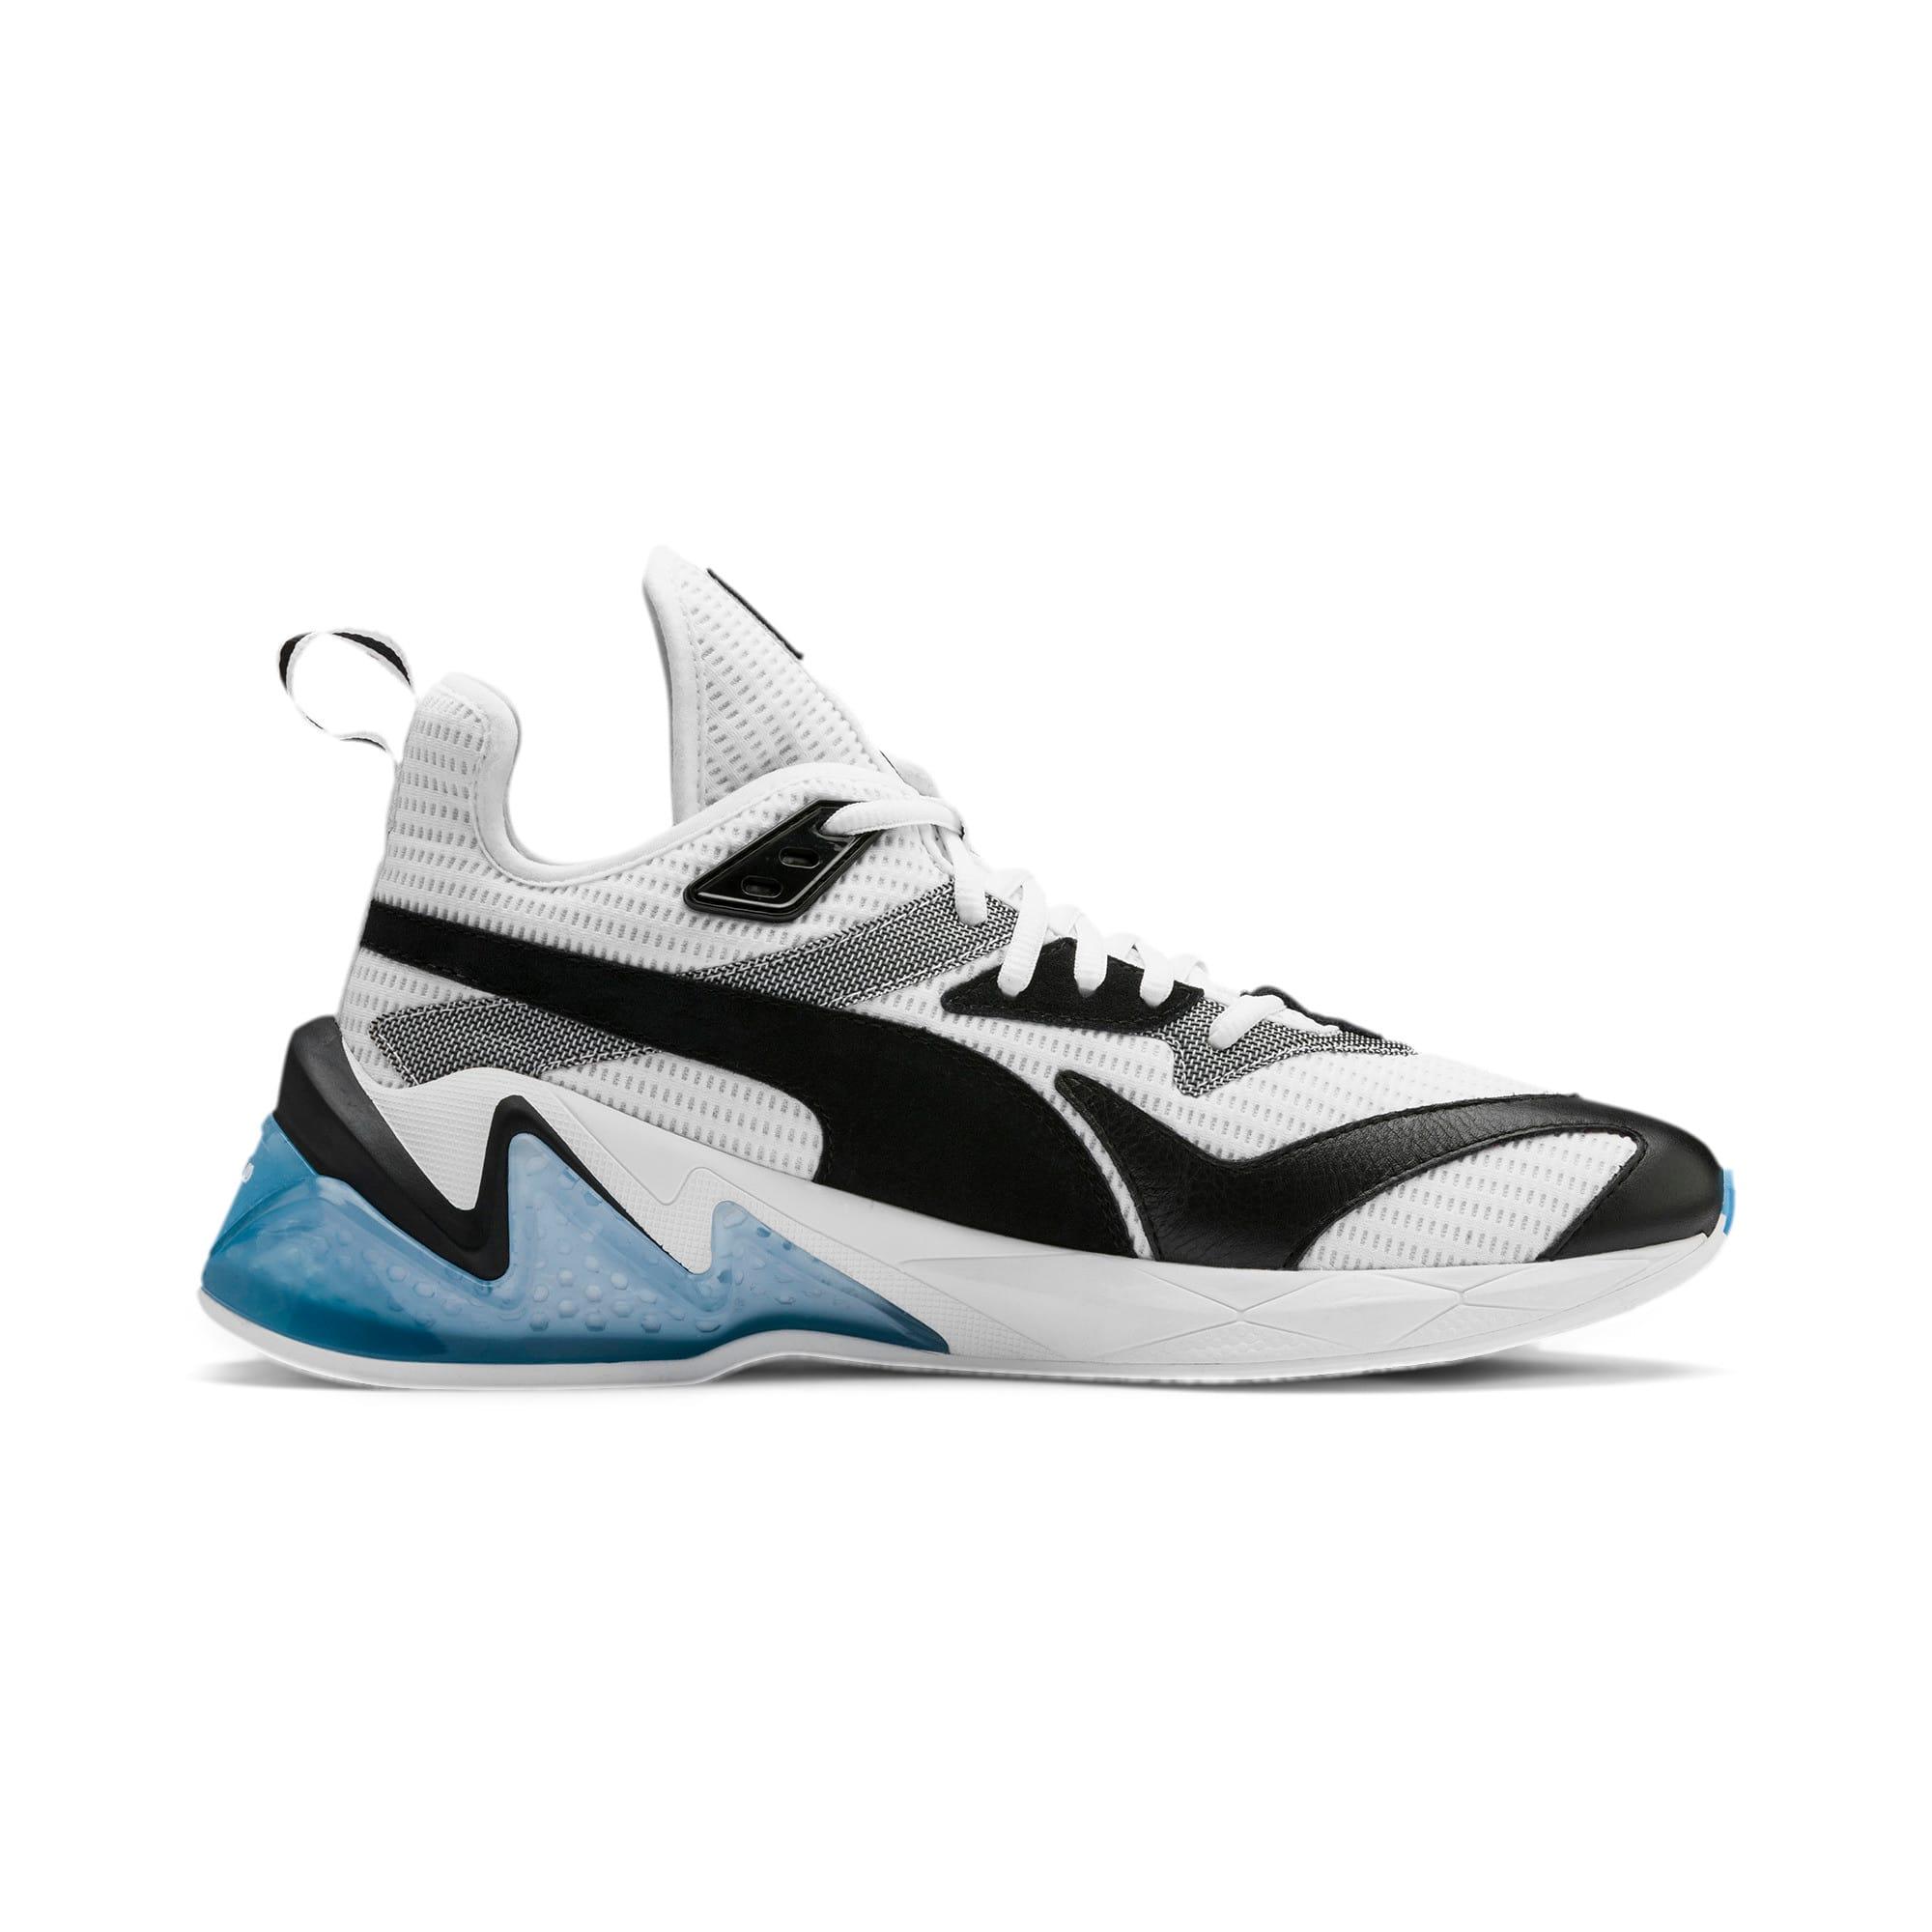 Thumbnail 6 of LQDCELL Origin Herren Sneaker, Puma White-Puma Black, medium